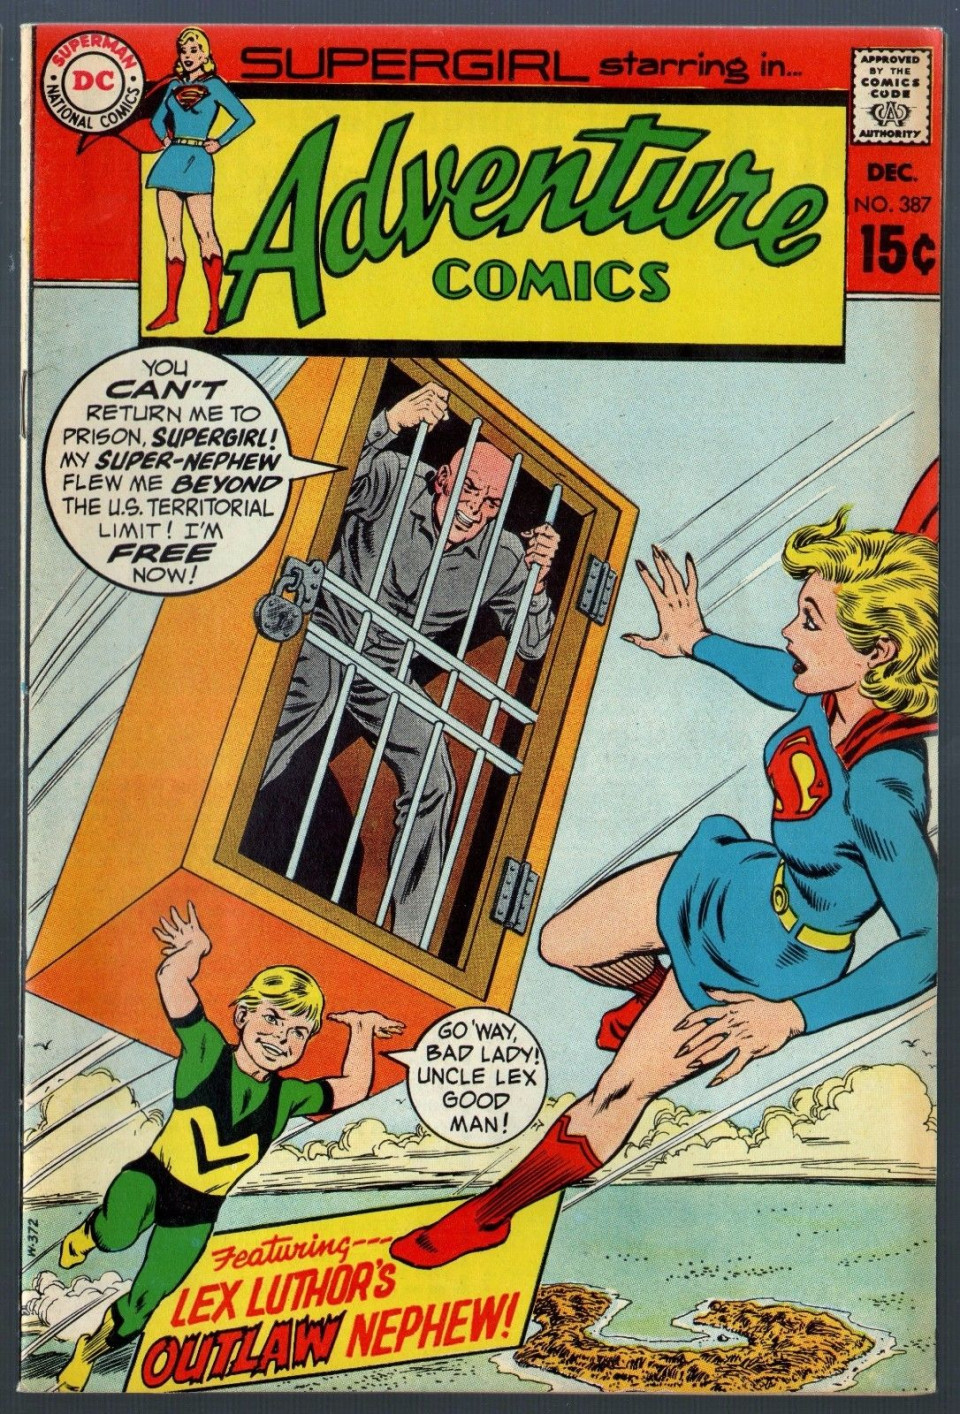 adventure  comics-co6e6819c10.jpg